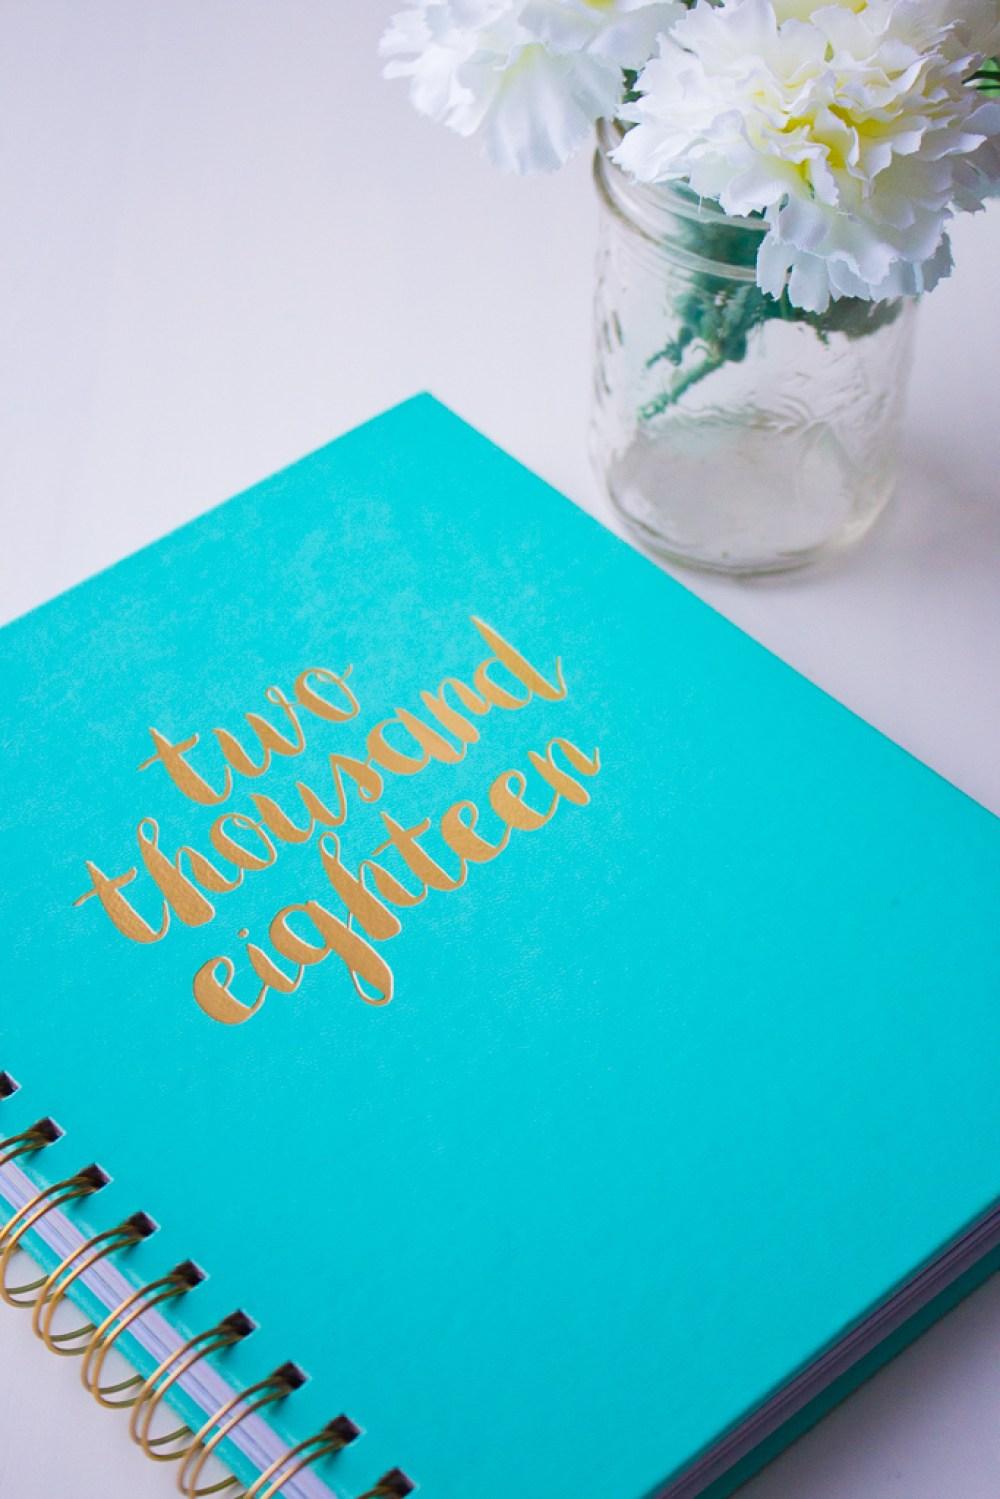 Lady Marielle | My 2018 Blogging Goals + 2017 Year Recap!